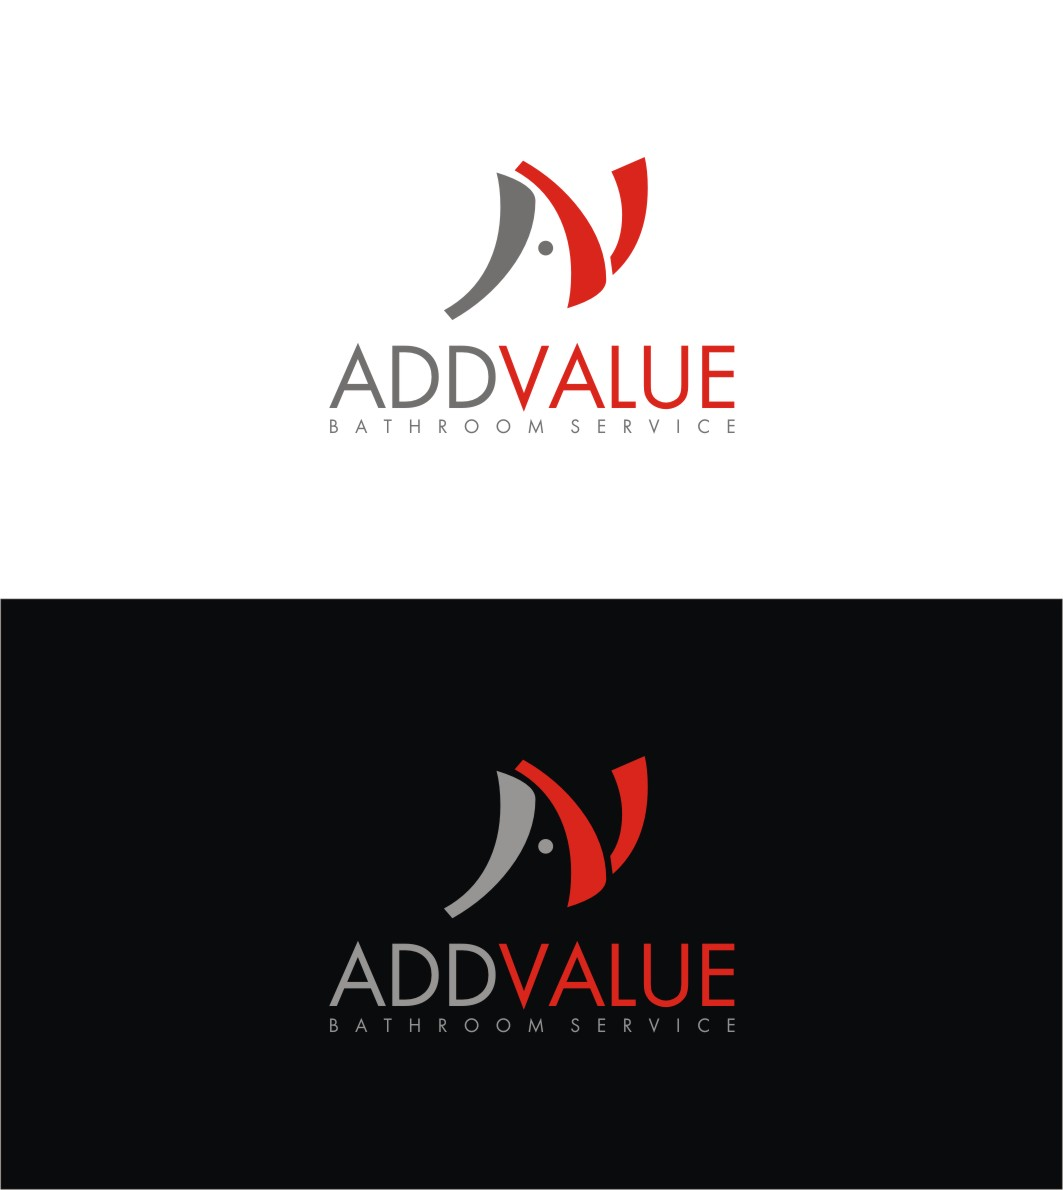 Logo Design By Gvijaya26 For Add Value Bathroom Service Needs A Cool New We